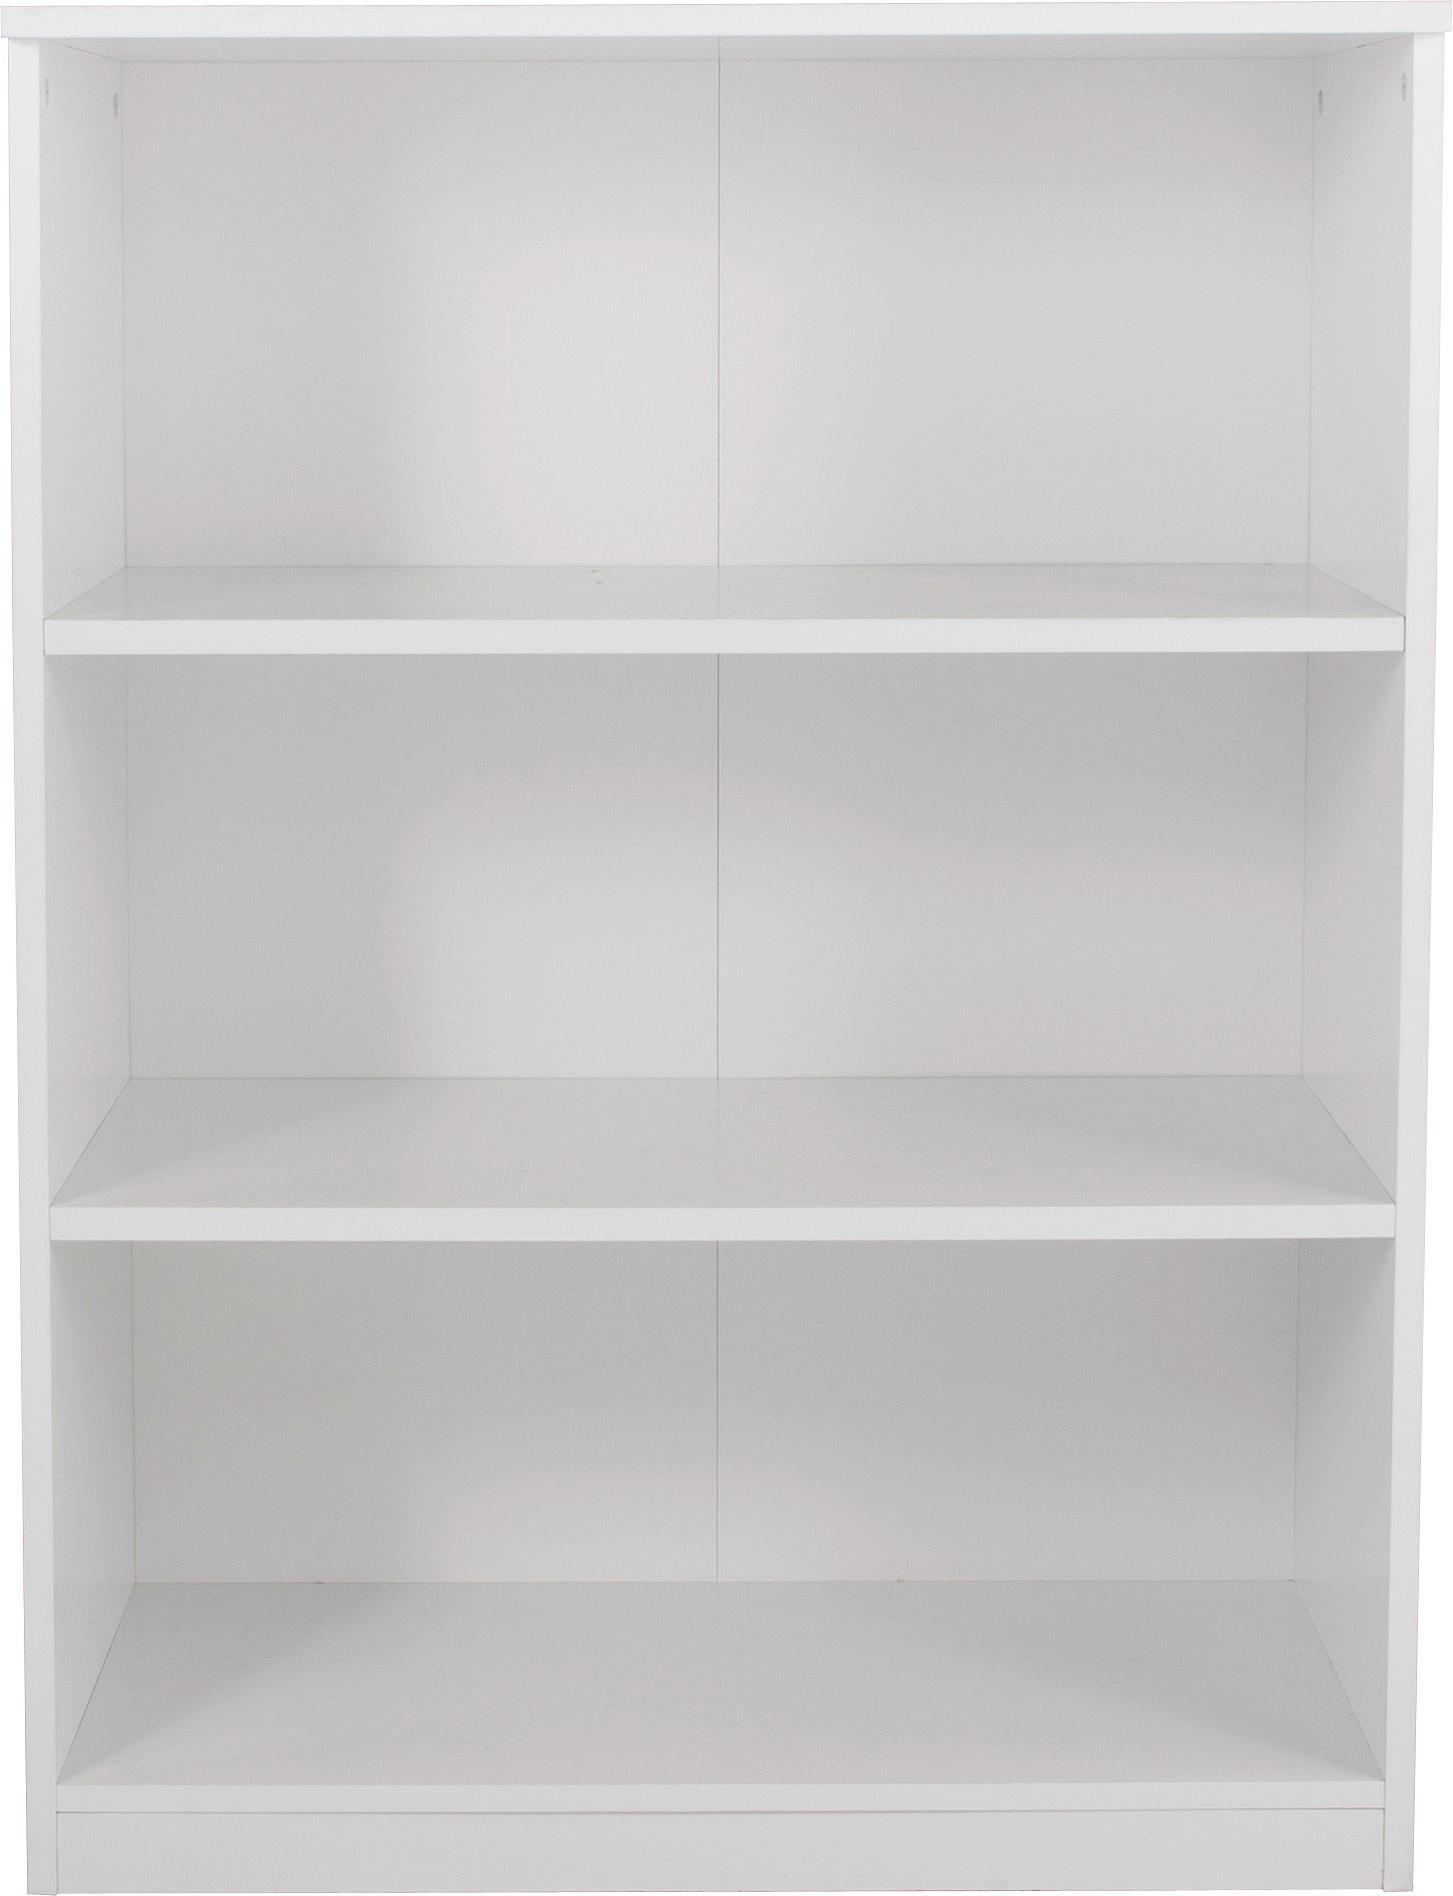 Argos Home Pagnell White 3 Shelf Bookcase